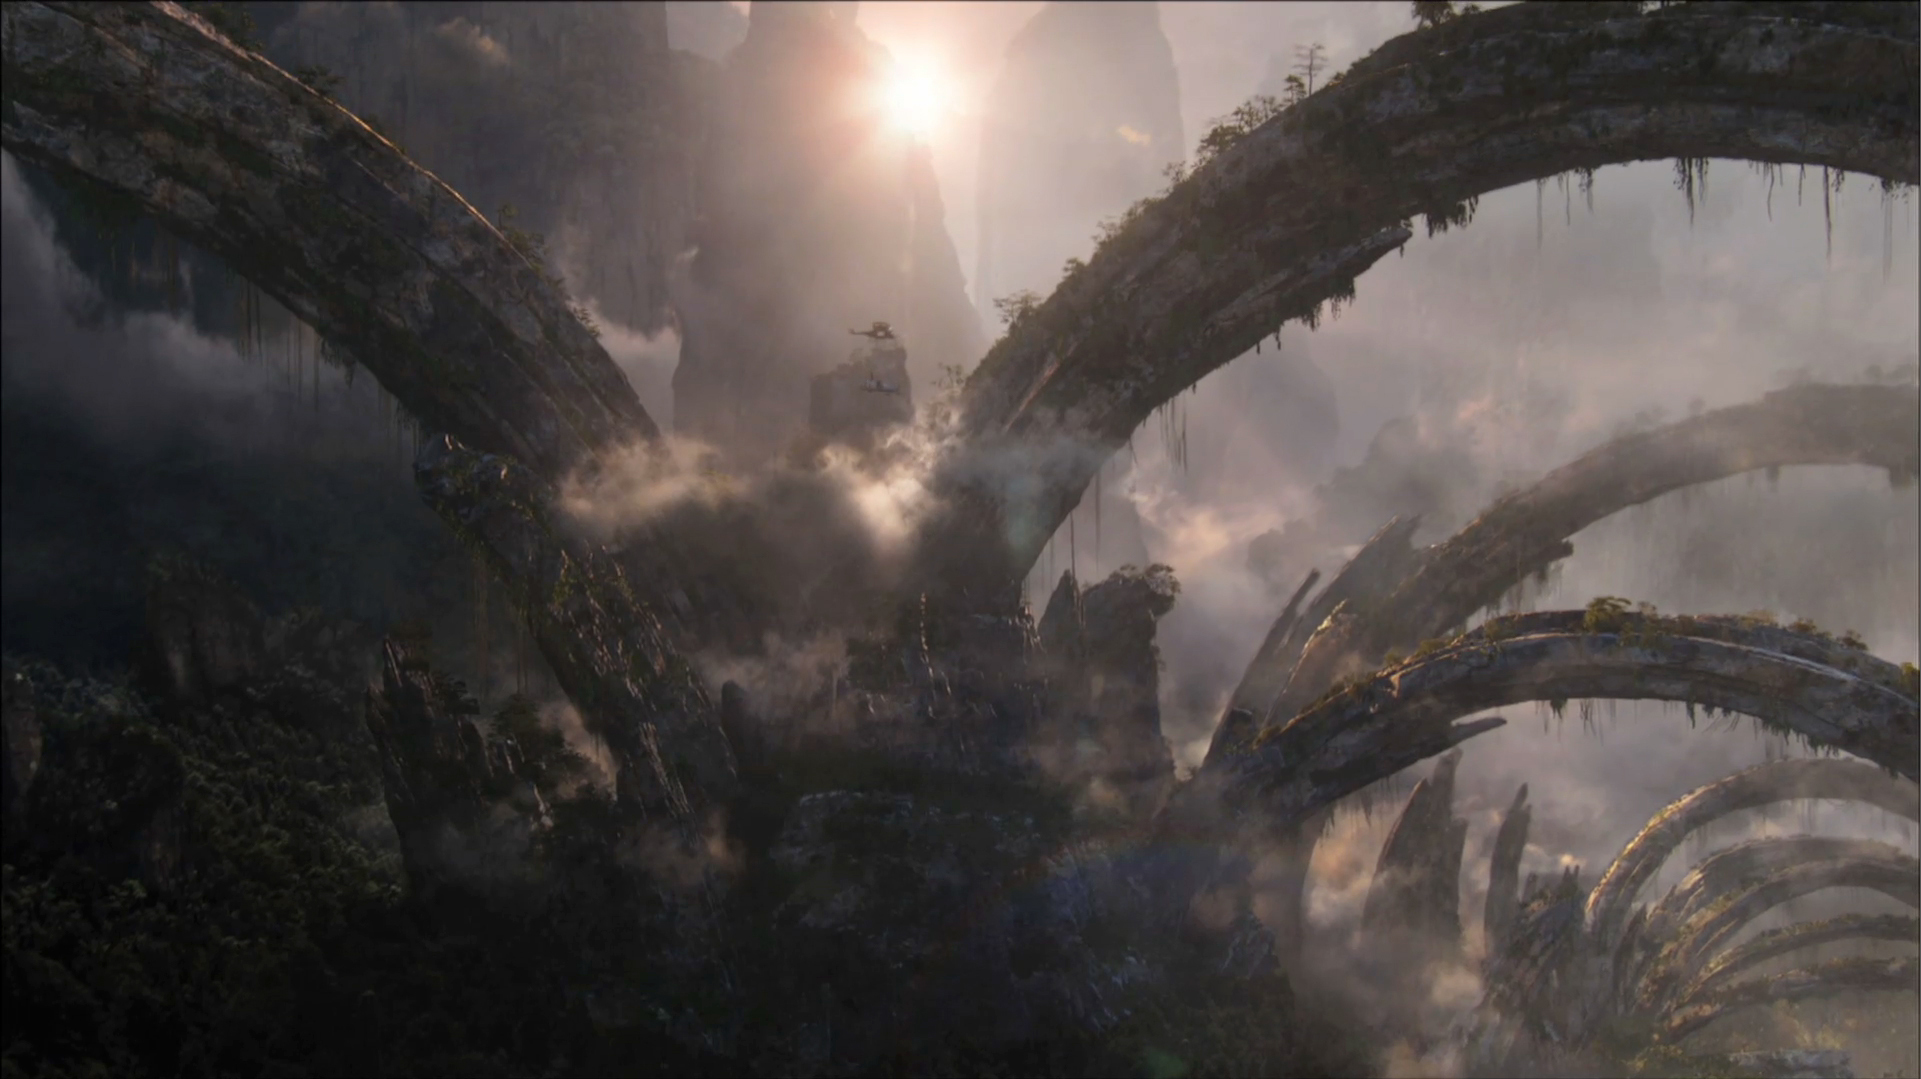 Arches of Pandora - Avatar Photo (10425006) - Fanpop